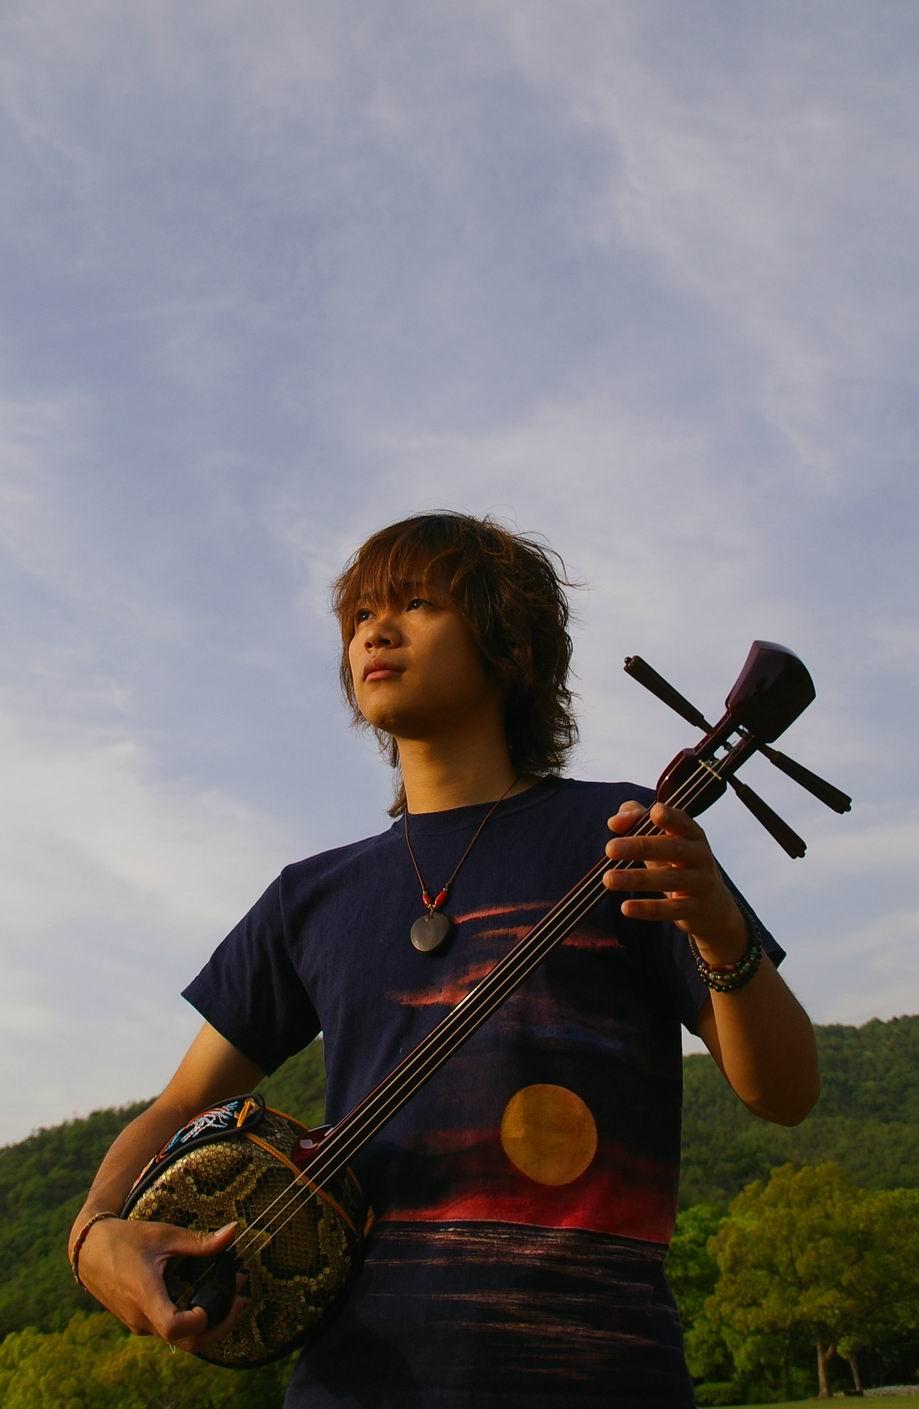 7/16mon『民ロック横丁 presents 【美らムジカVOL.2】』